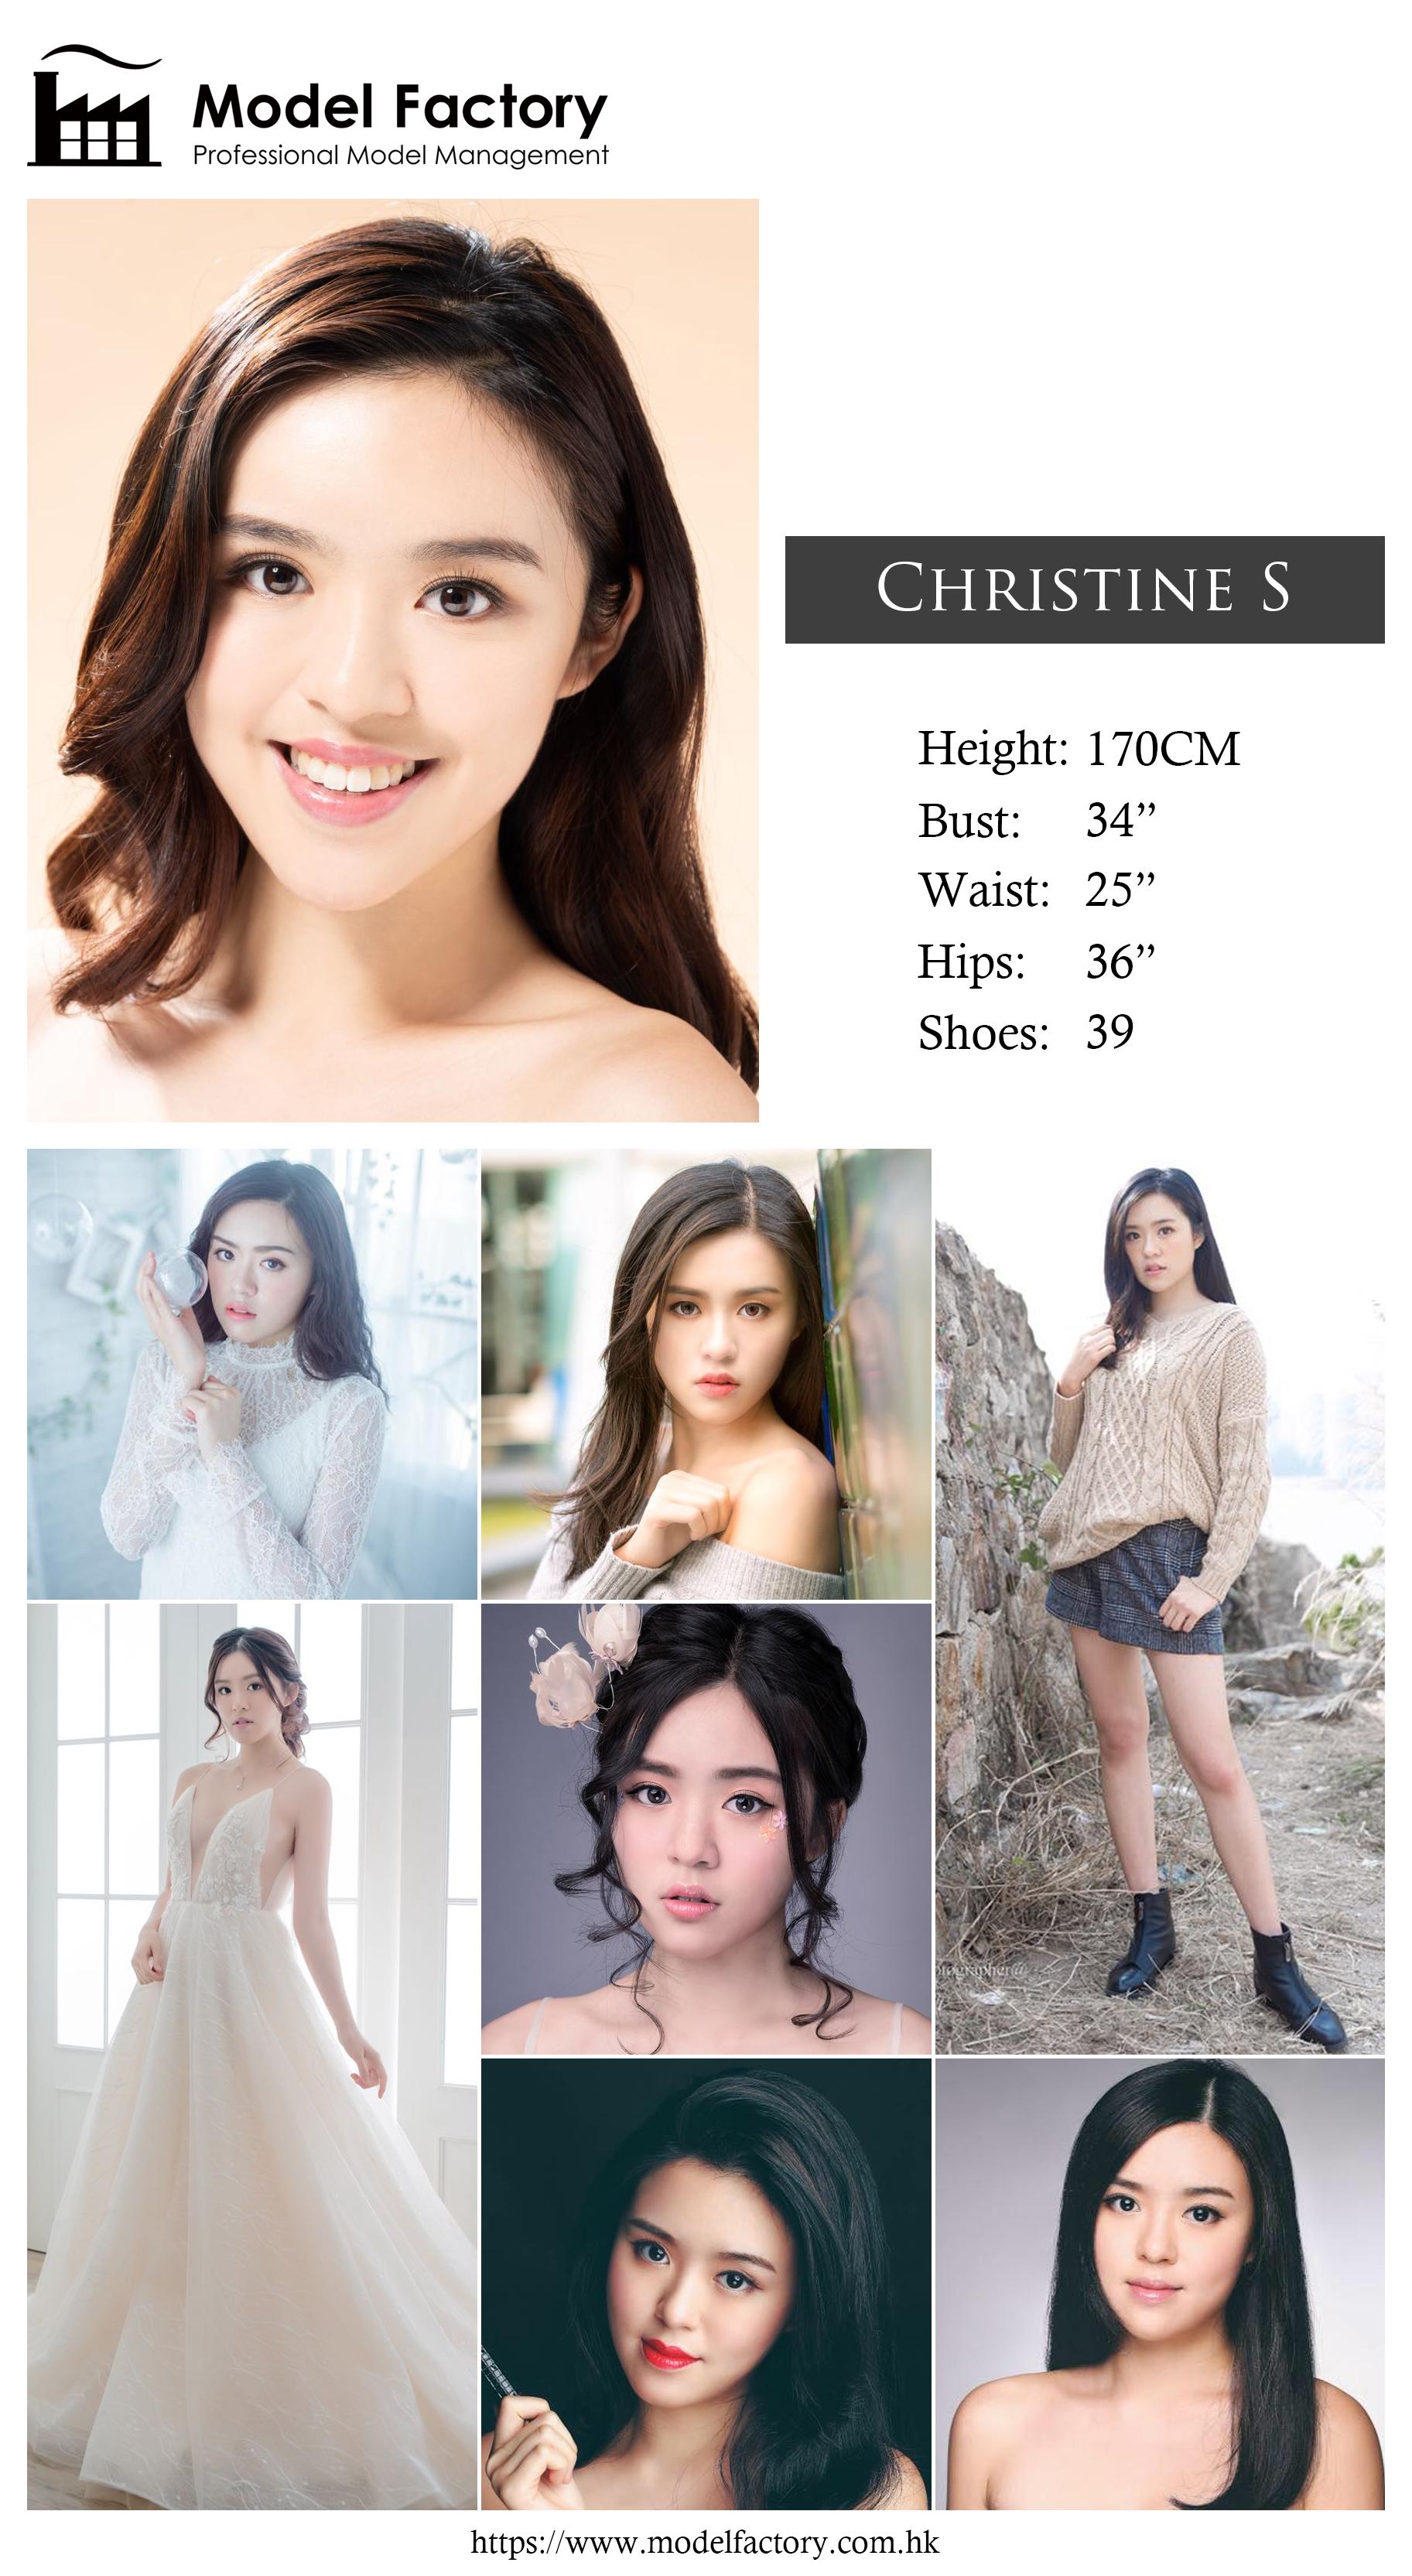 Model Factory Hong Kong Female Model ChristineS